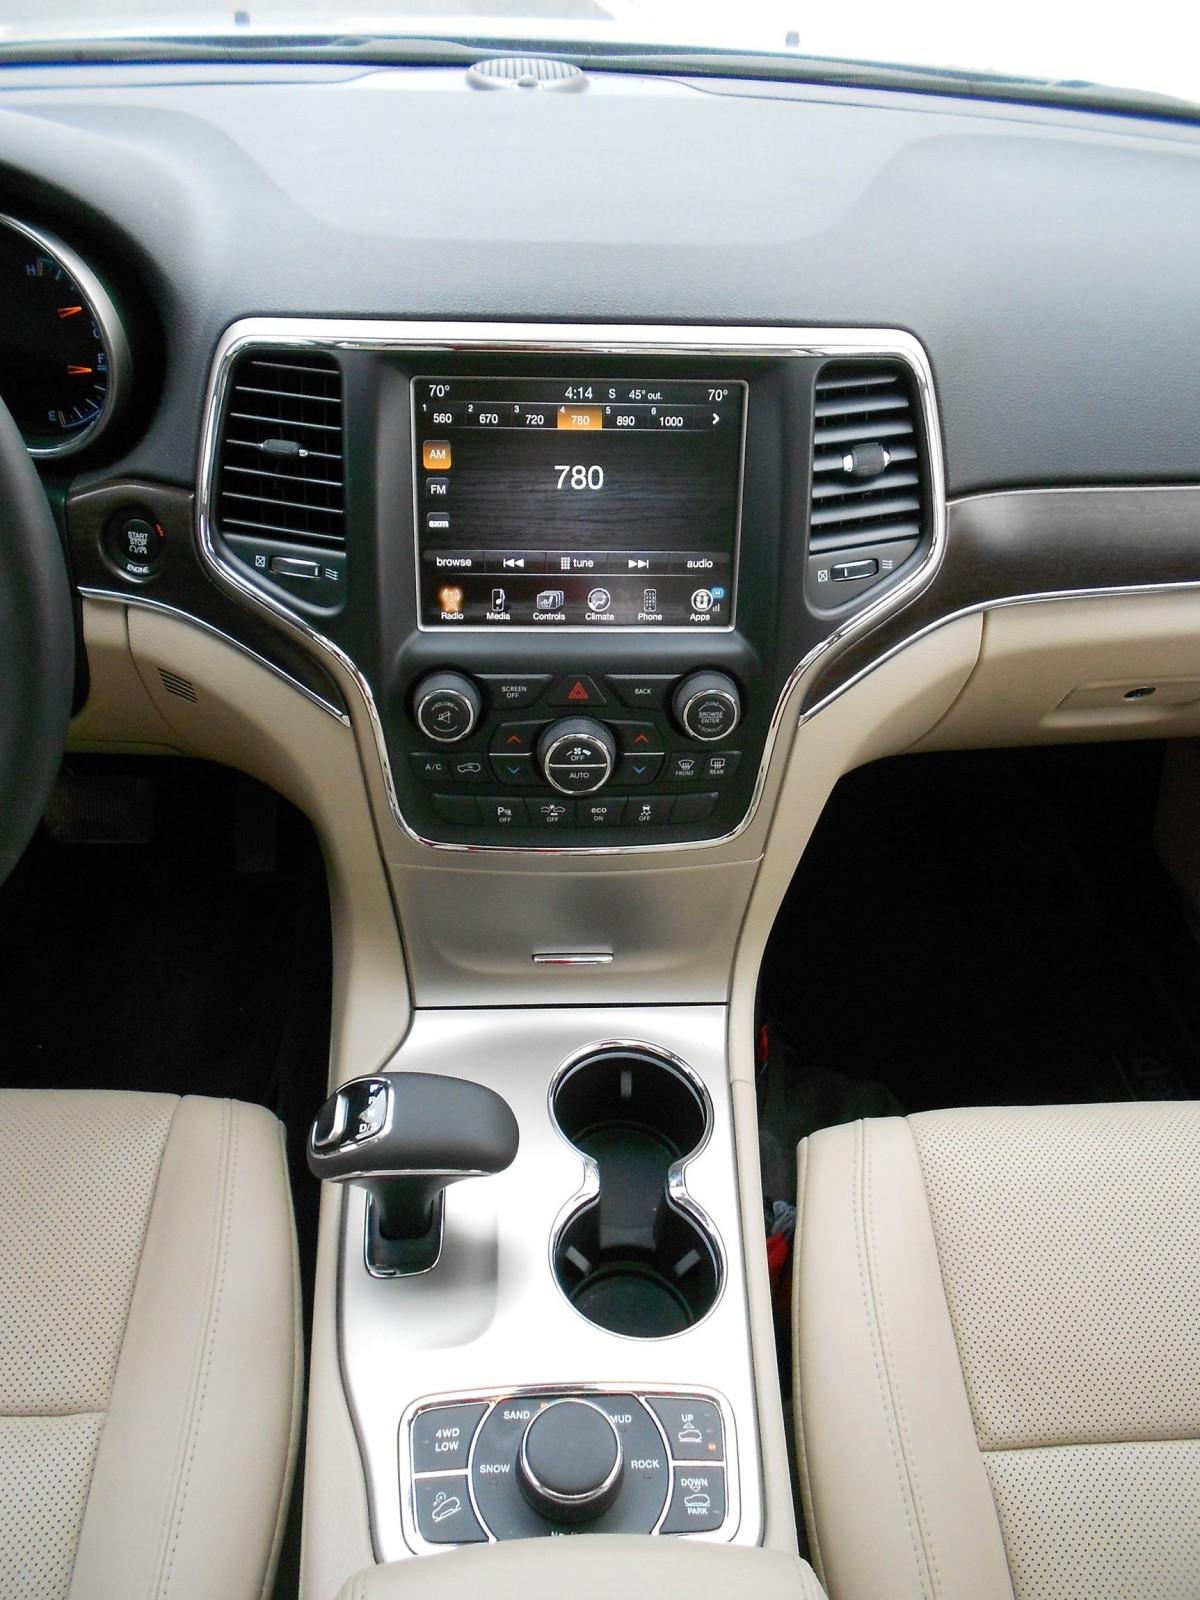 ecodiesel long term reliability test autos post. Black Bedroom Furniture Sets. Home Design Ideas